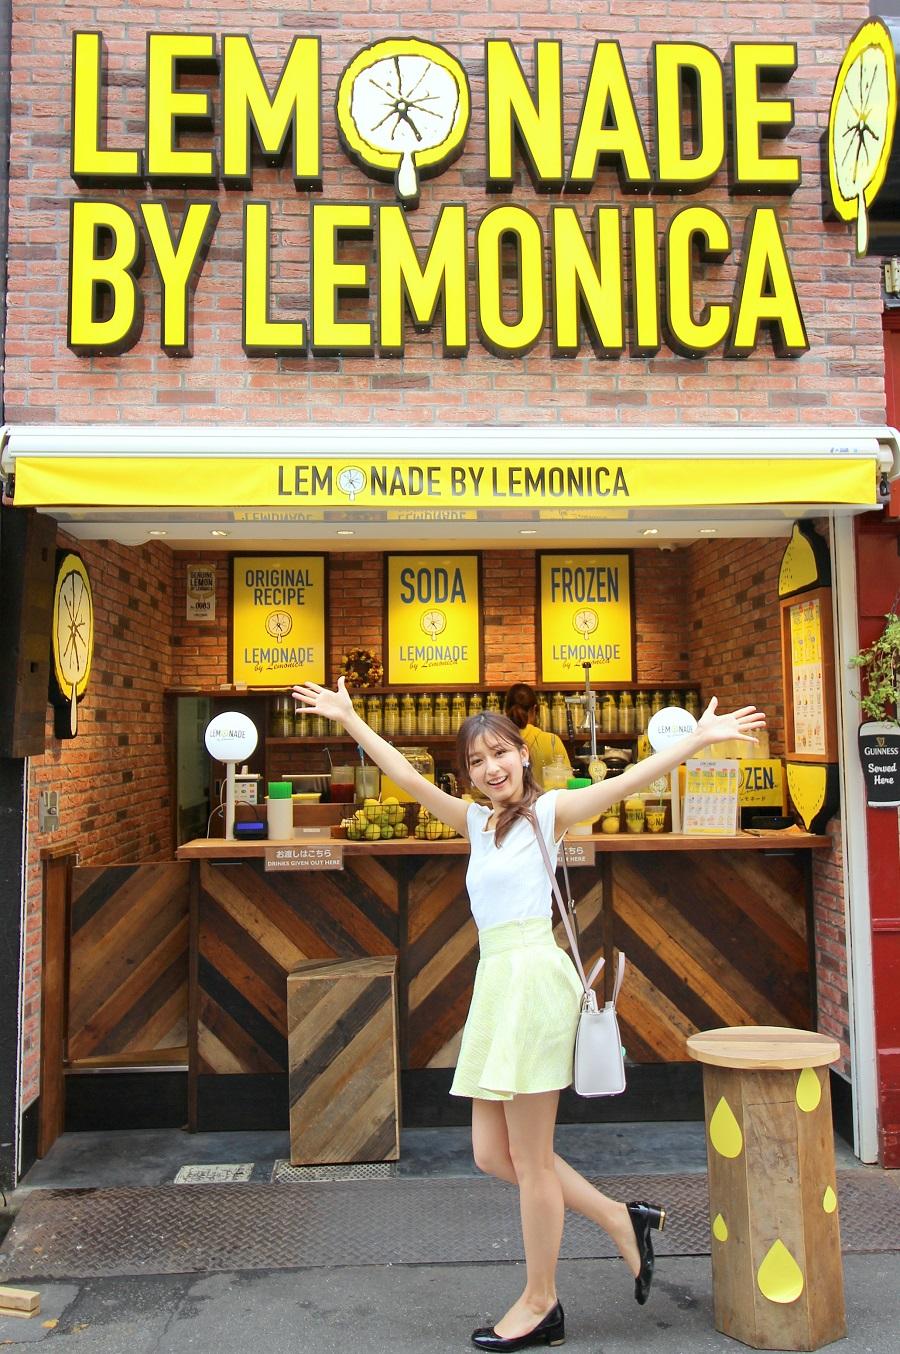 LEMONADE by Lemonica 下北沢店外観